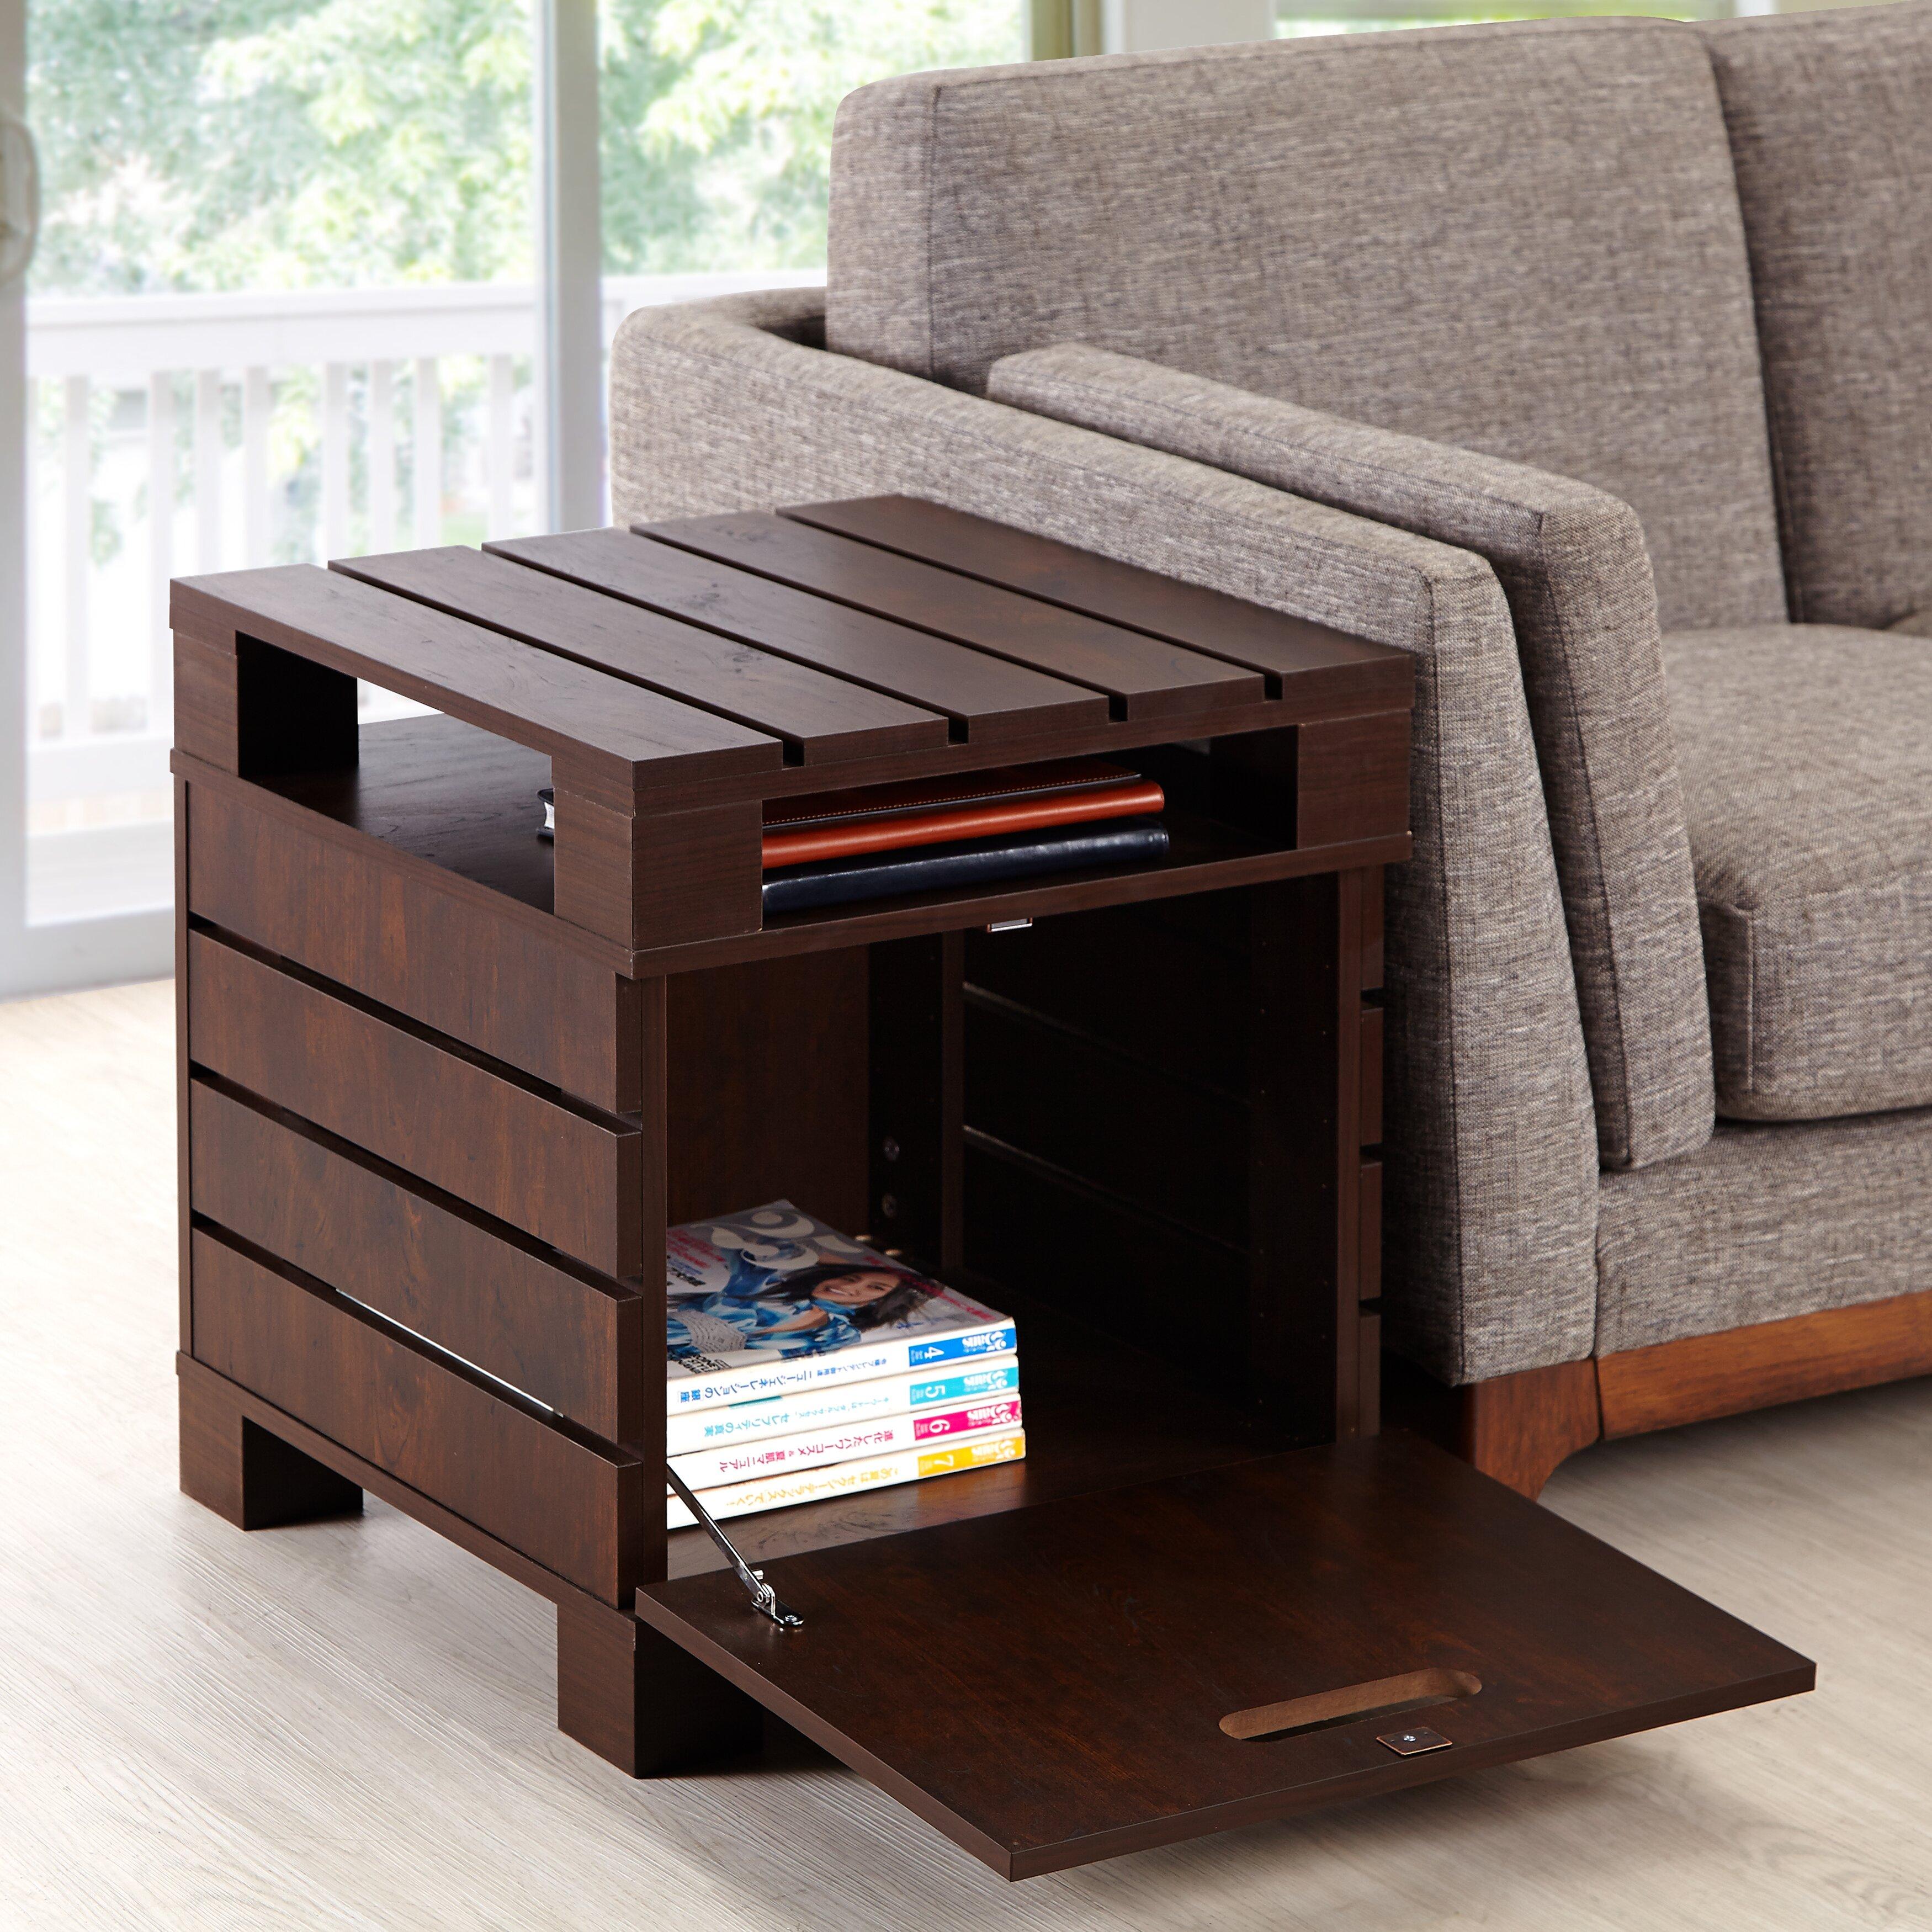 hokku designs pallet end table reviews wayfair. Black Bedroom Furniture Sets. Home Design Ideas